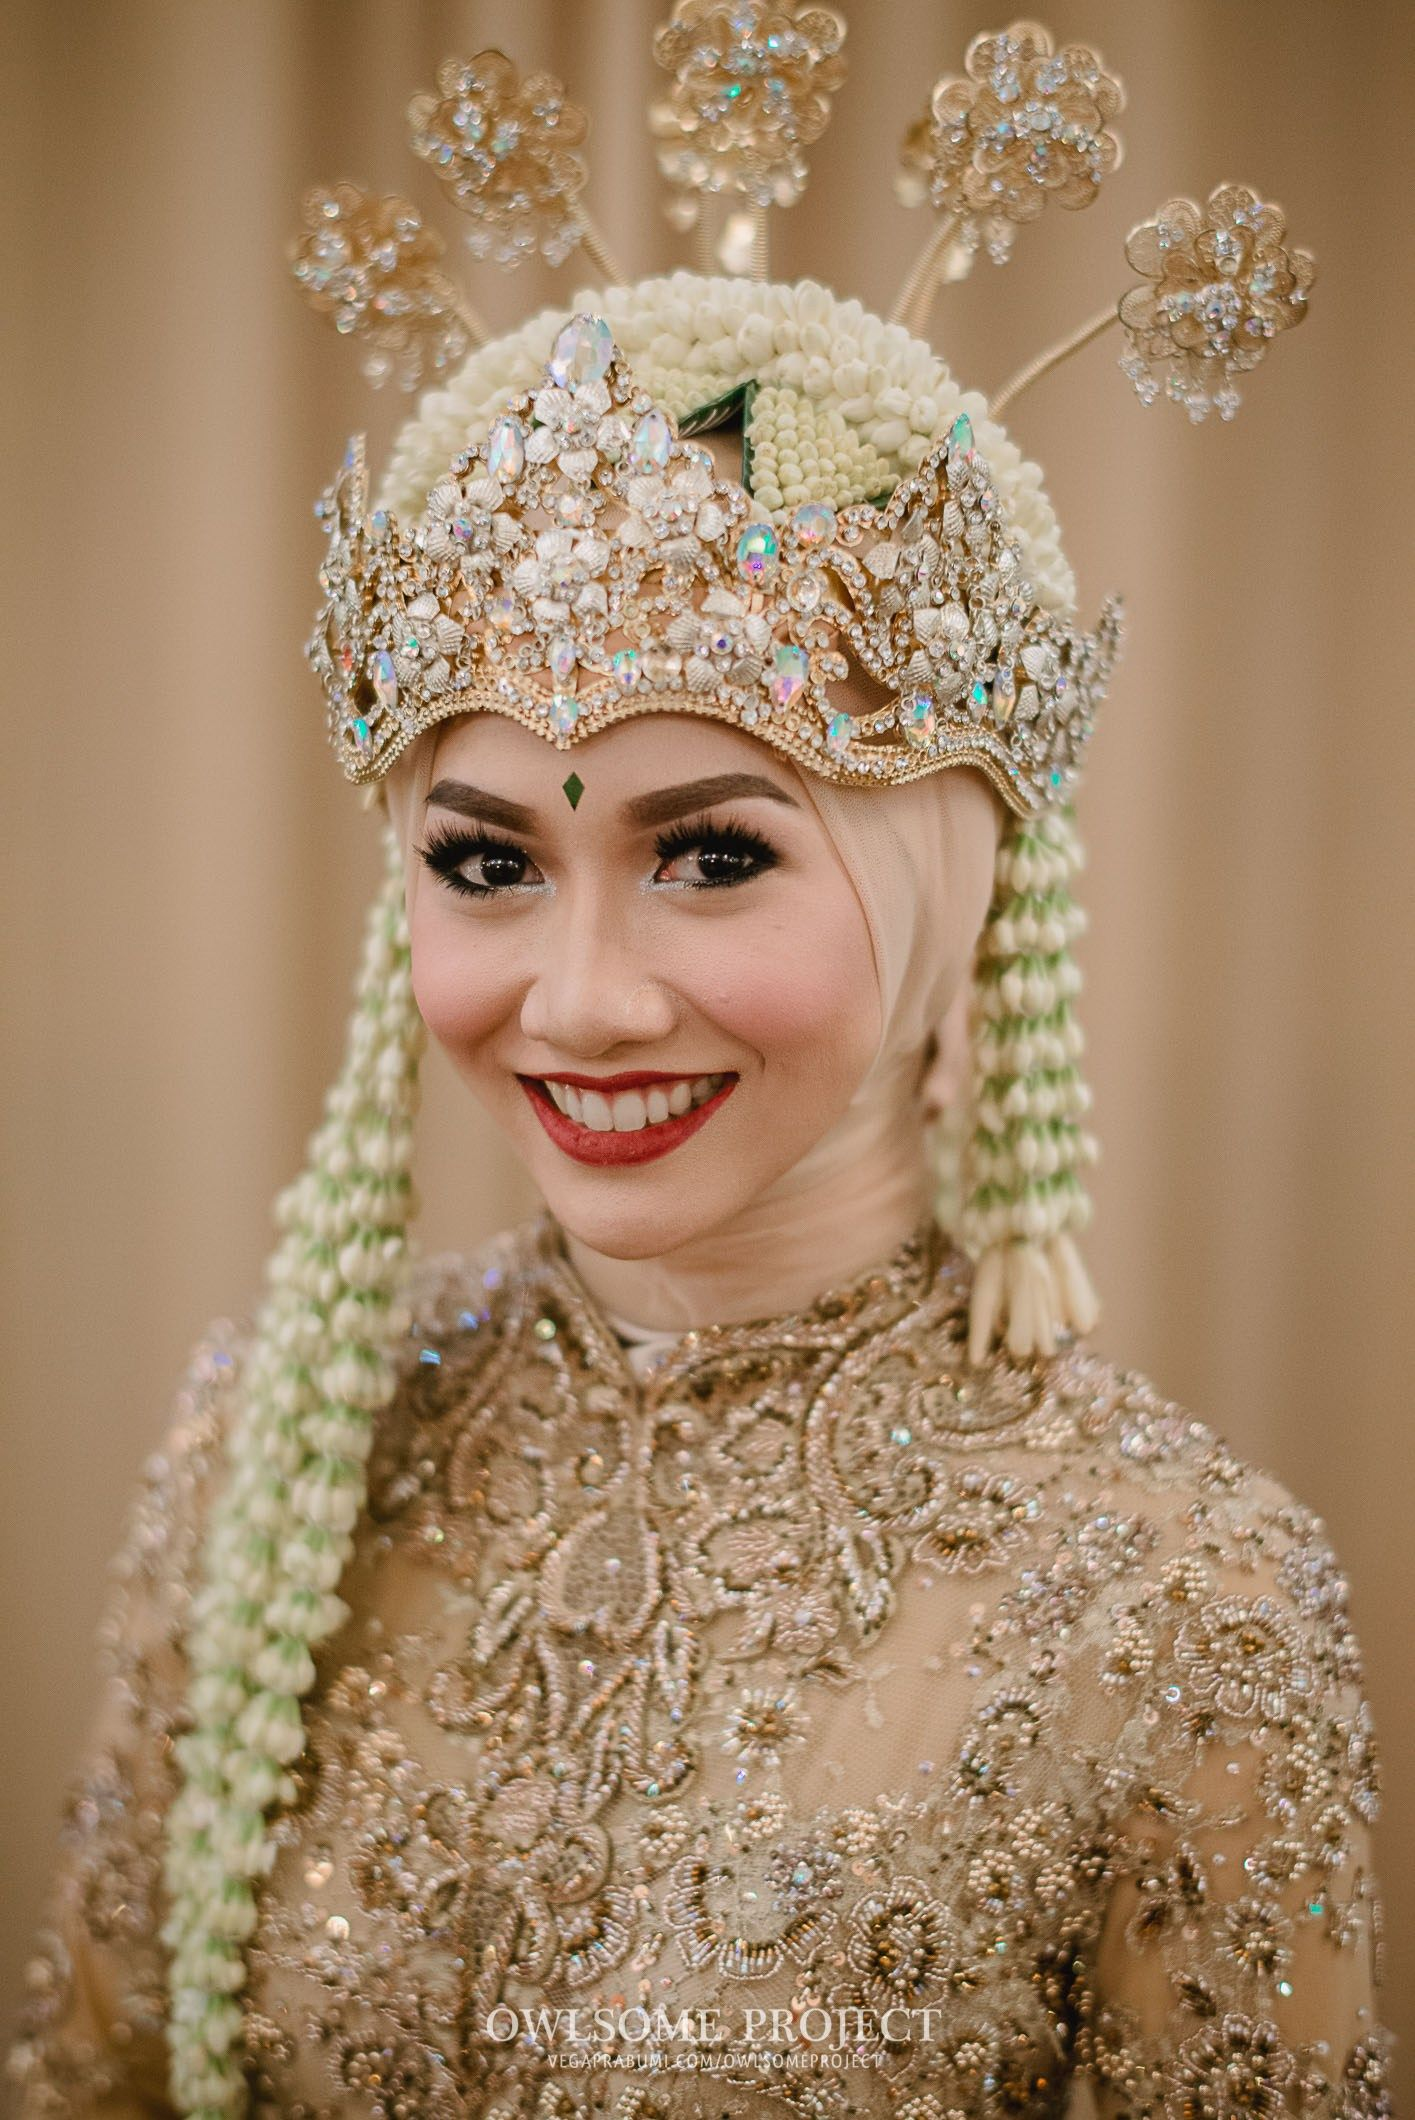 Pernikahan adat Sunda dengan Sentuhan Hijau - owlsome (10 of 10